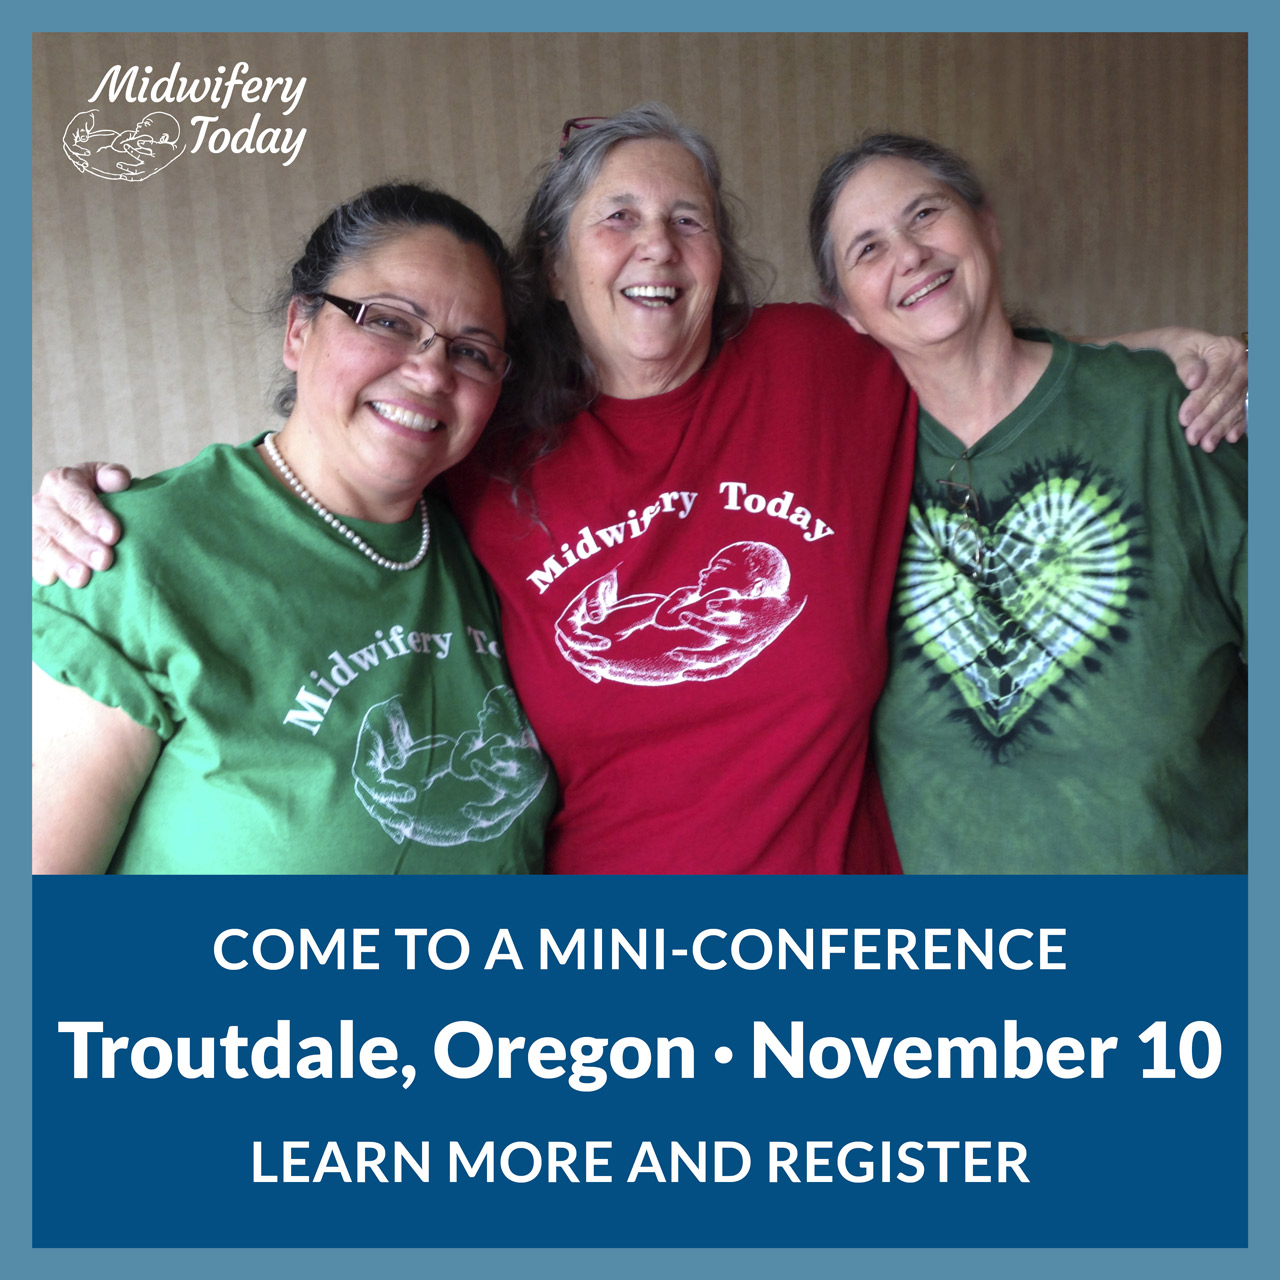 Midwifery Today Mini-Conference/Retreat Troutdale, Oregon   November 10, 2017